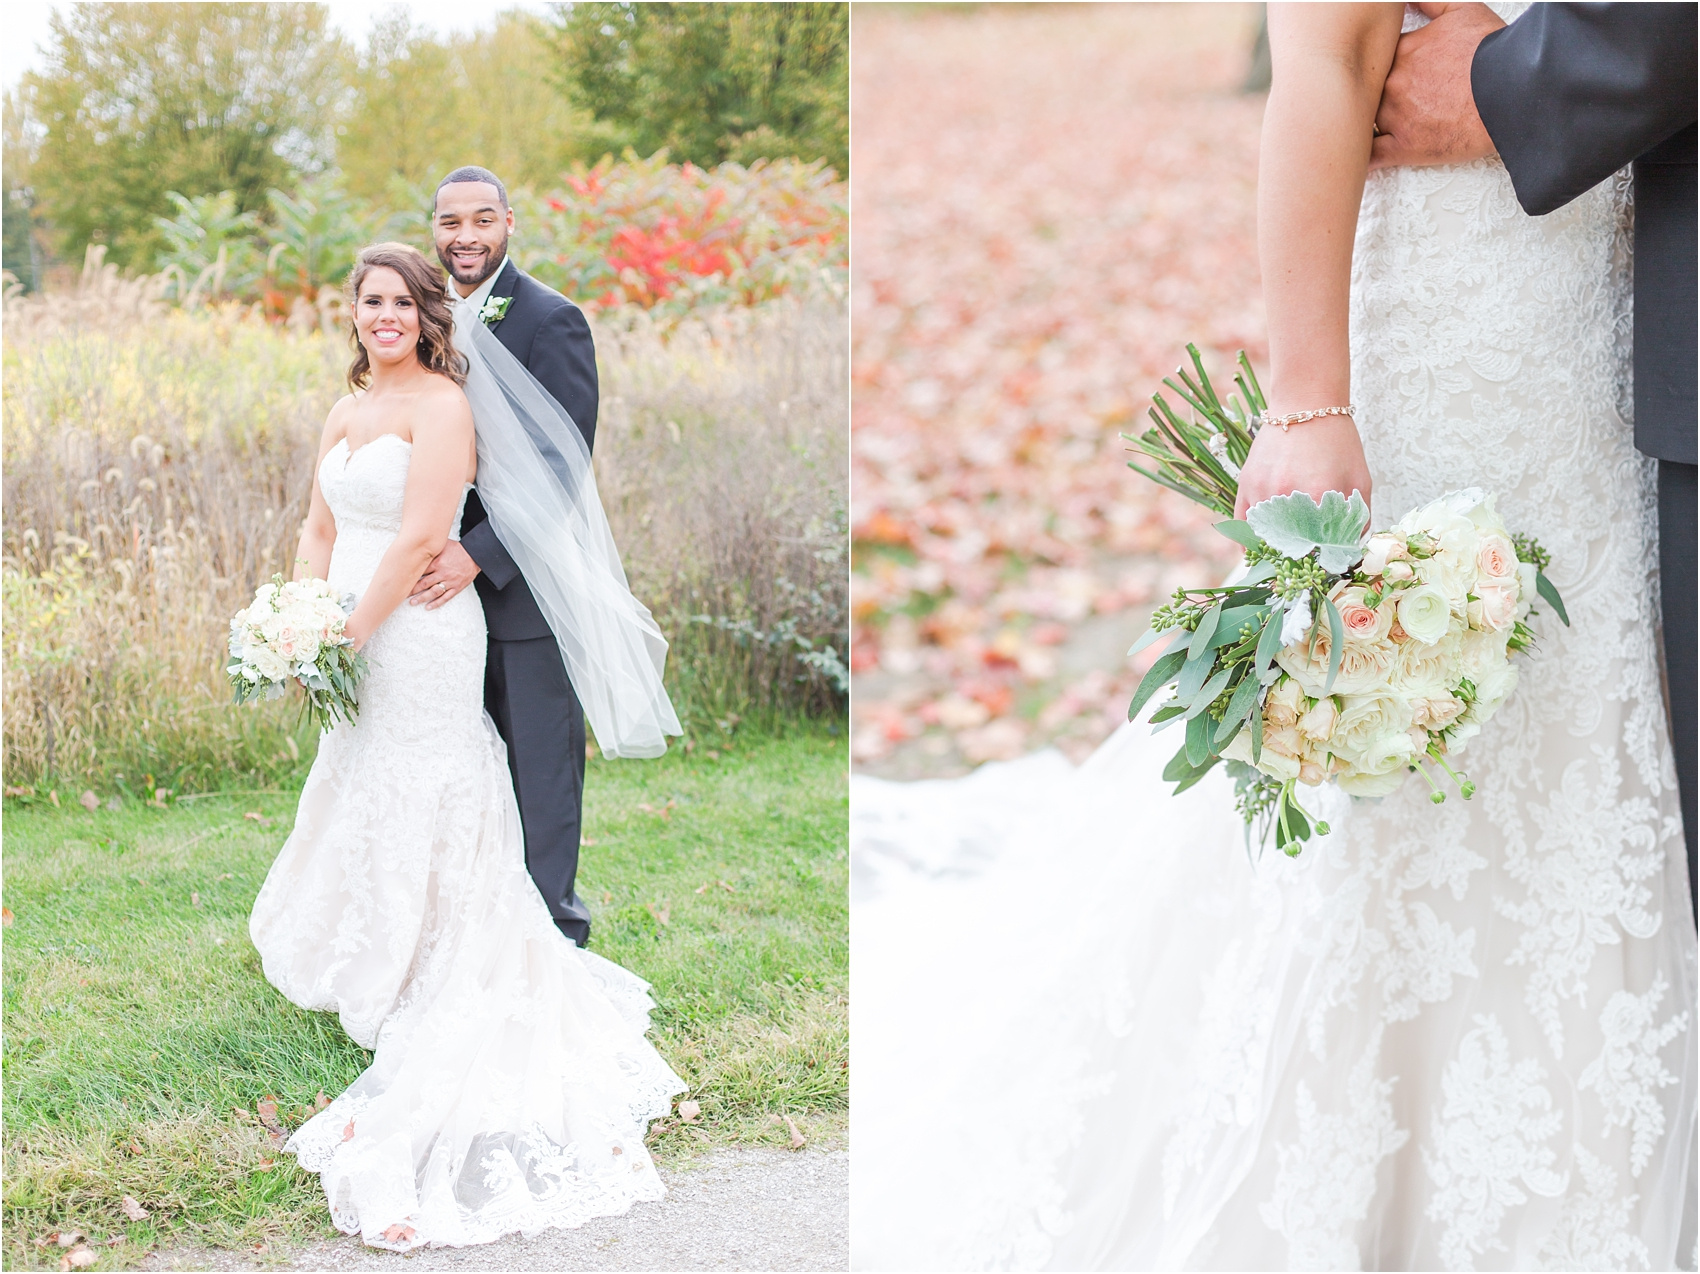 elegant-and-romantic-fall-wedding-photos-at-st-marys-catholic-church-in-monroe-michigan-by-courtney-carolyn-photography_0052.jpg